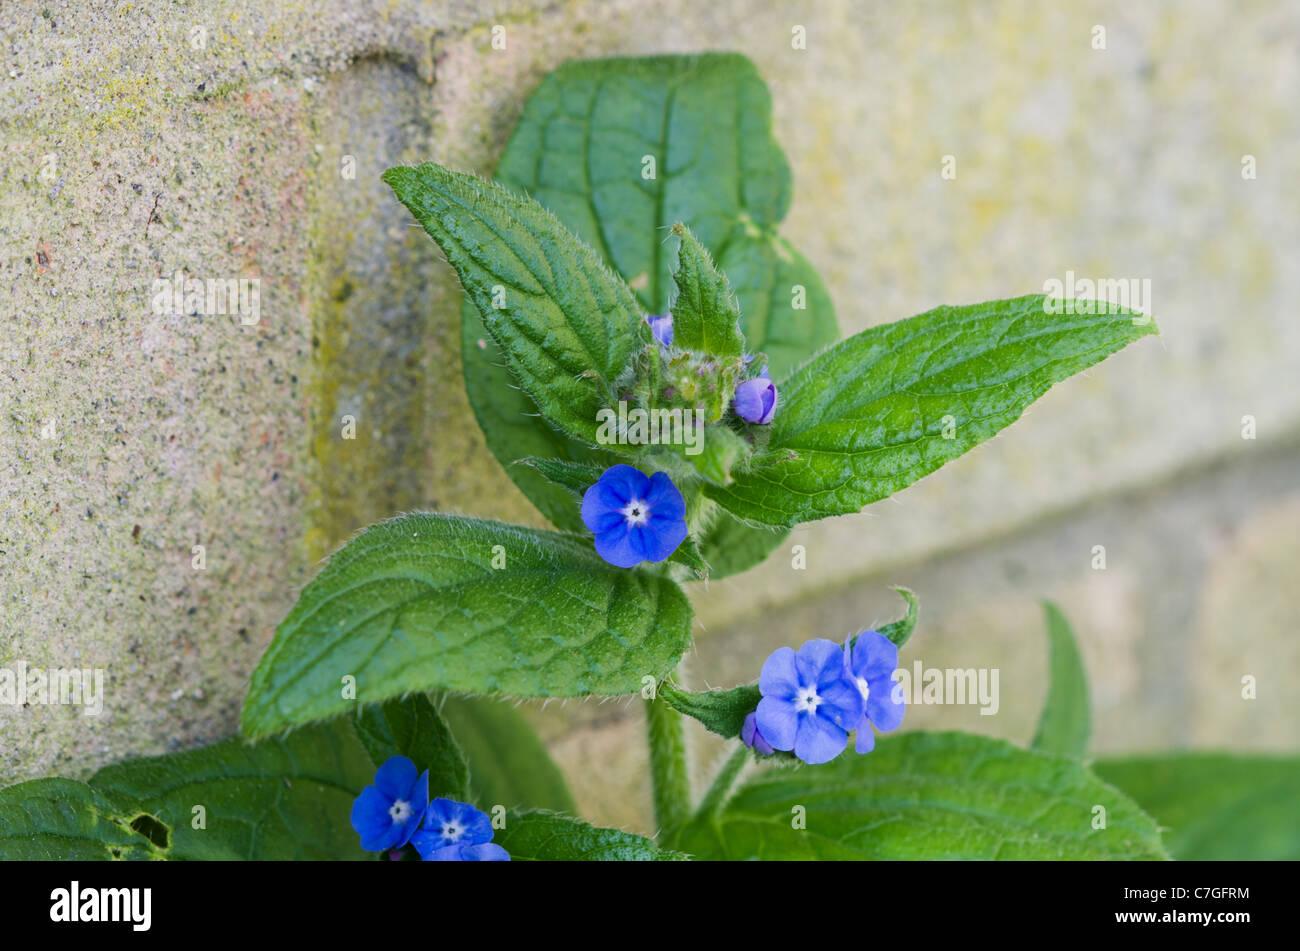 Pentaglottis sempervirens - Stock Image